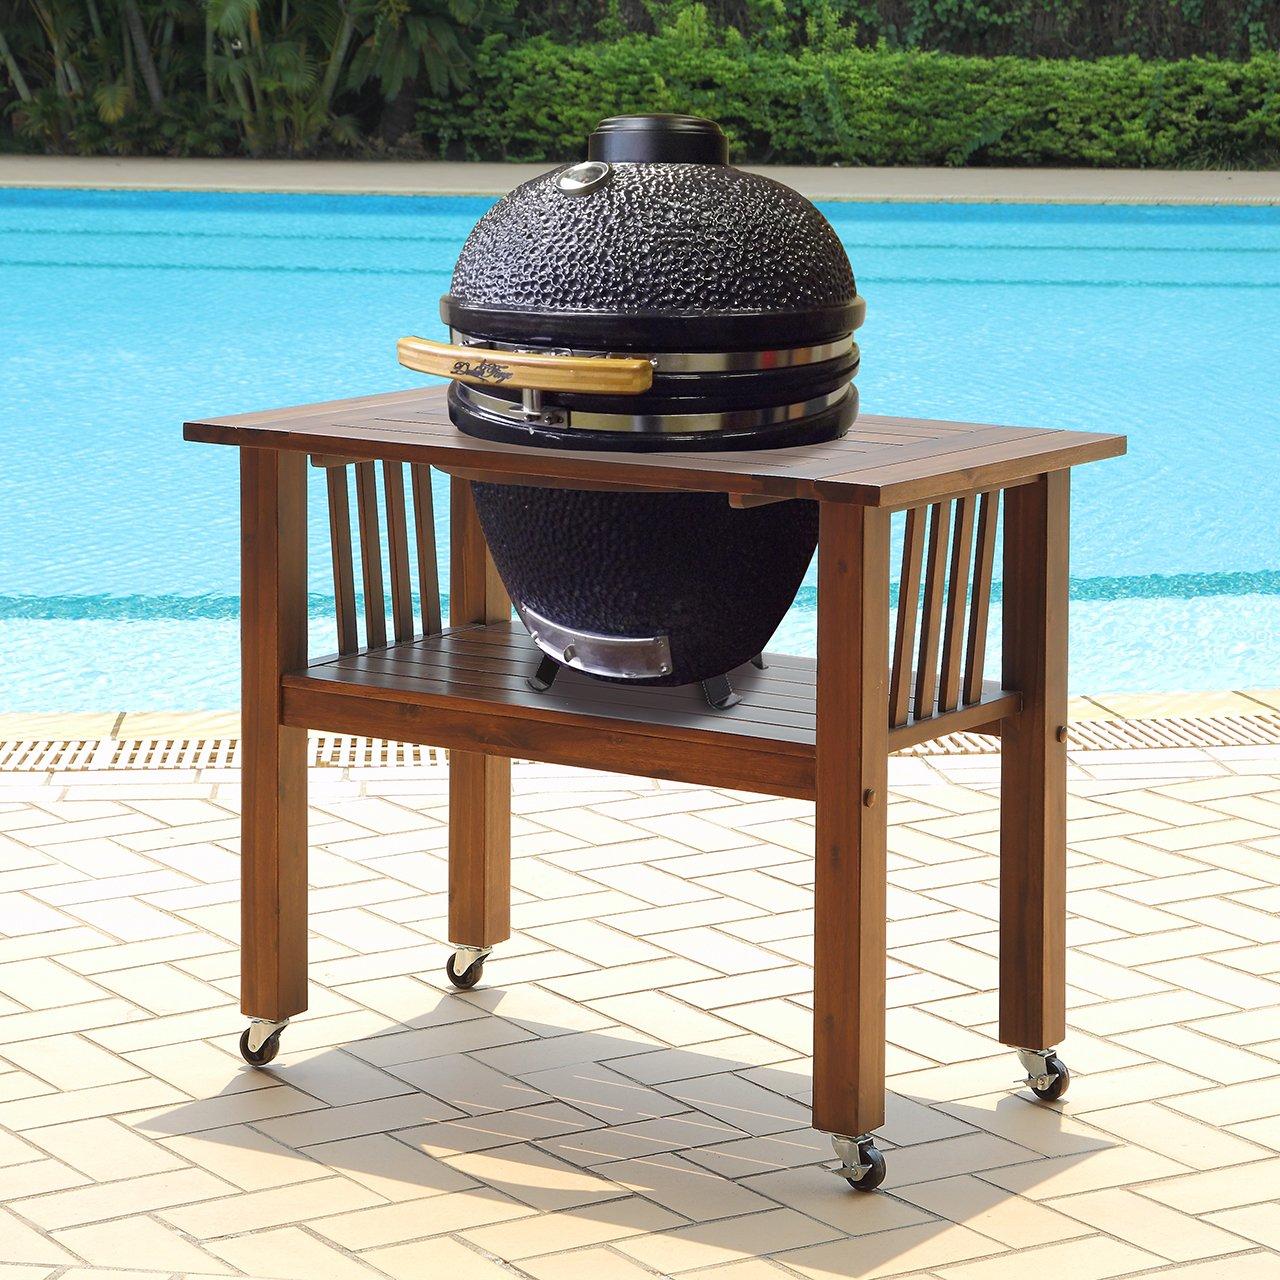 Amazon.com : Duluth Forge Kamado Ceramic Egg Smoker Grill With Table    Medium Model : Garden U0026 Outdoor